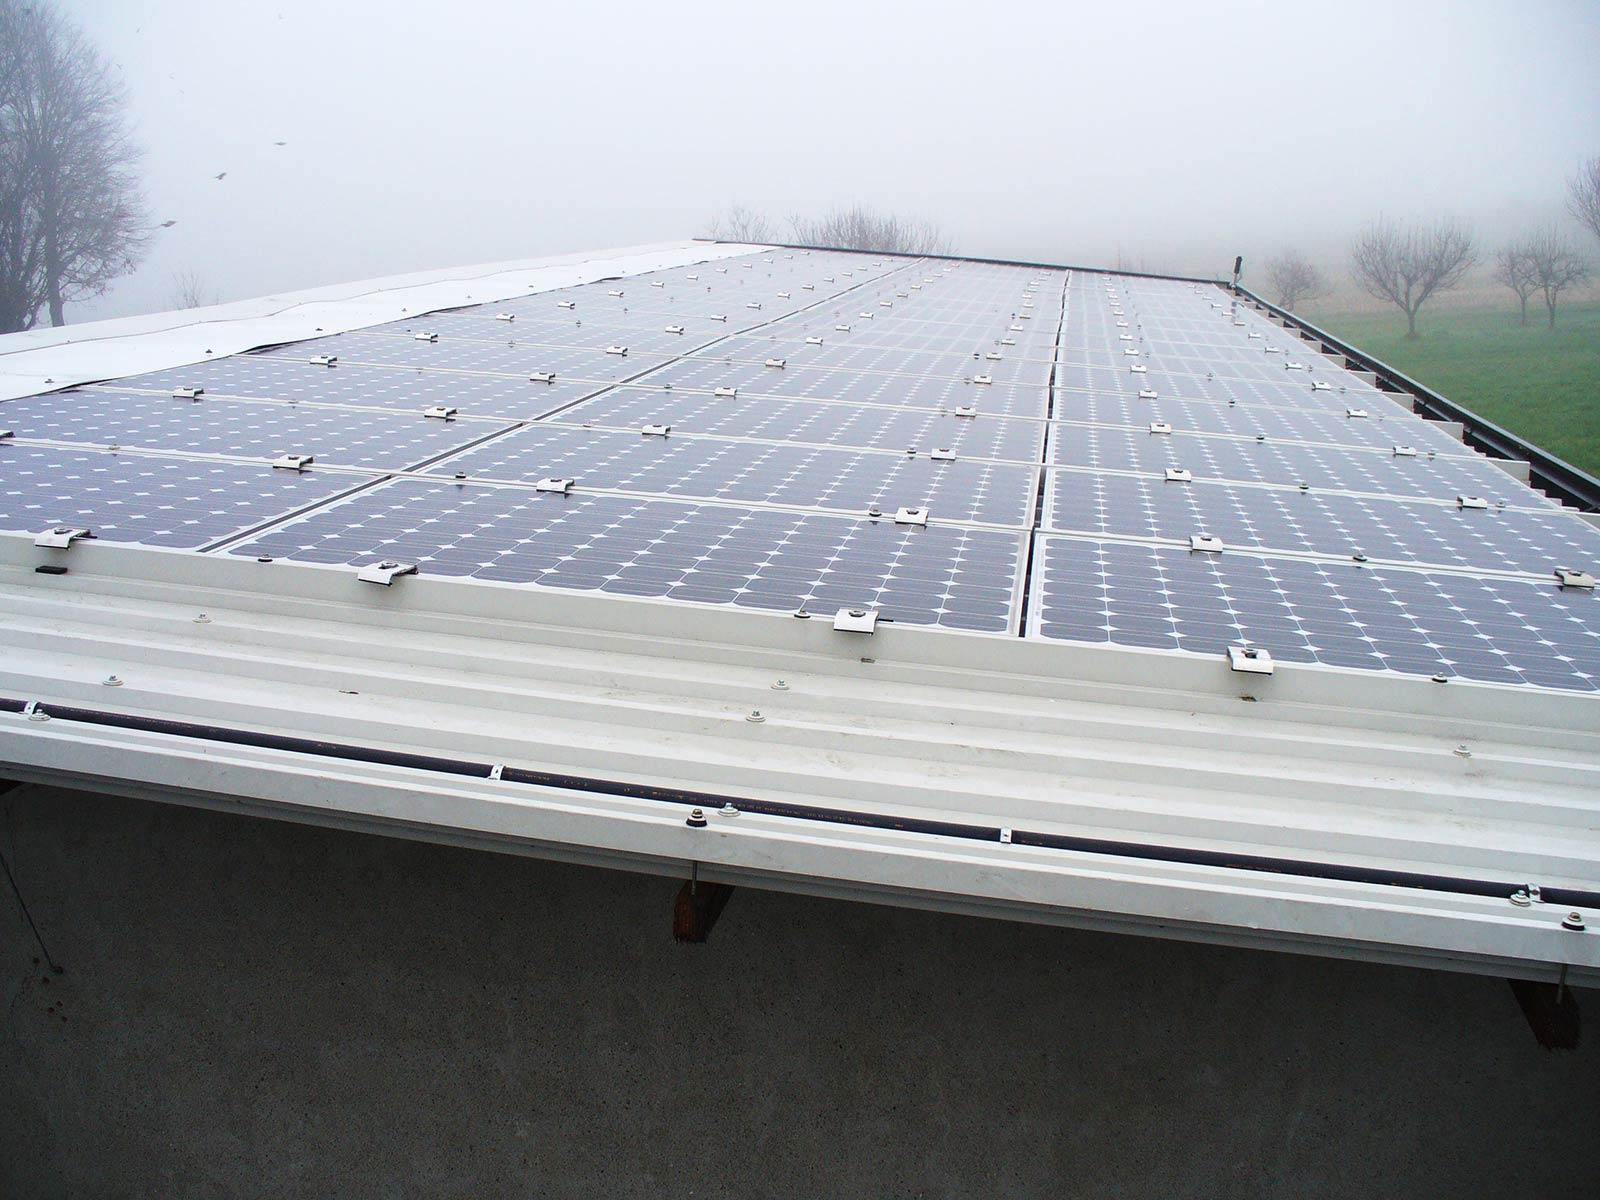 pannelli-fotovoltaici-6